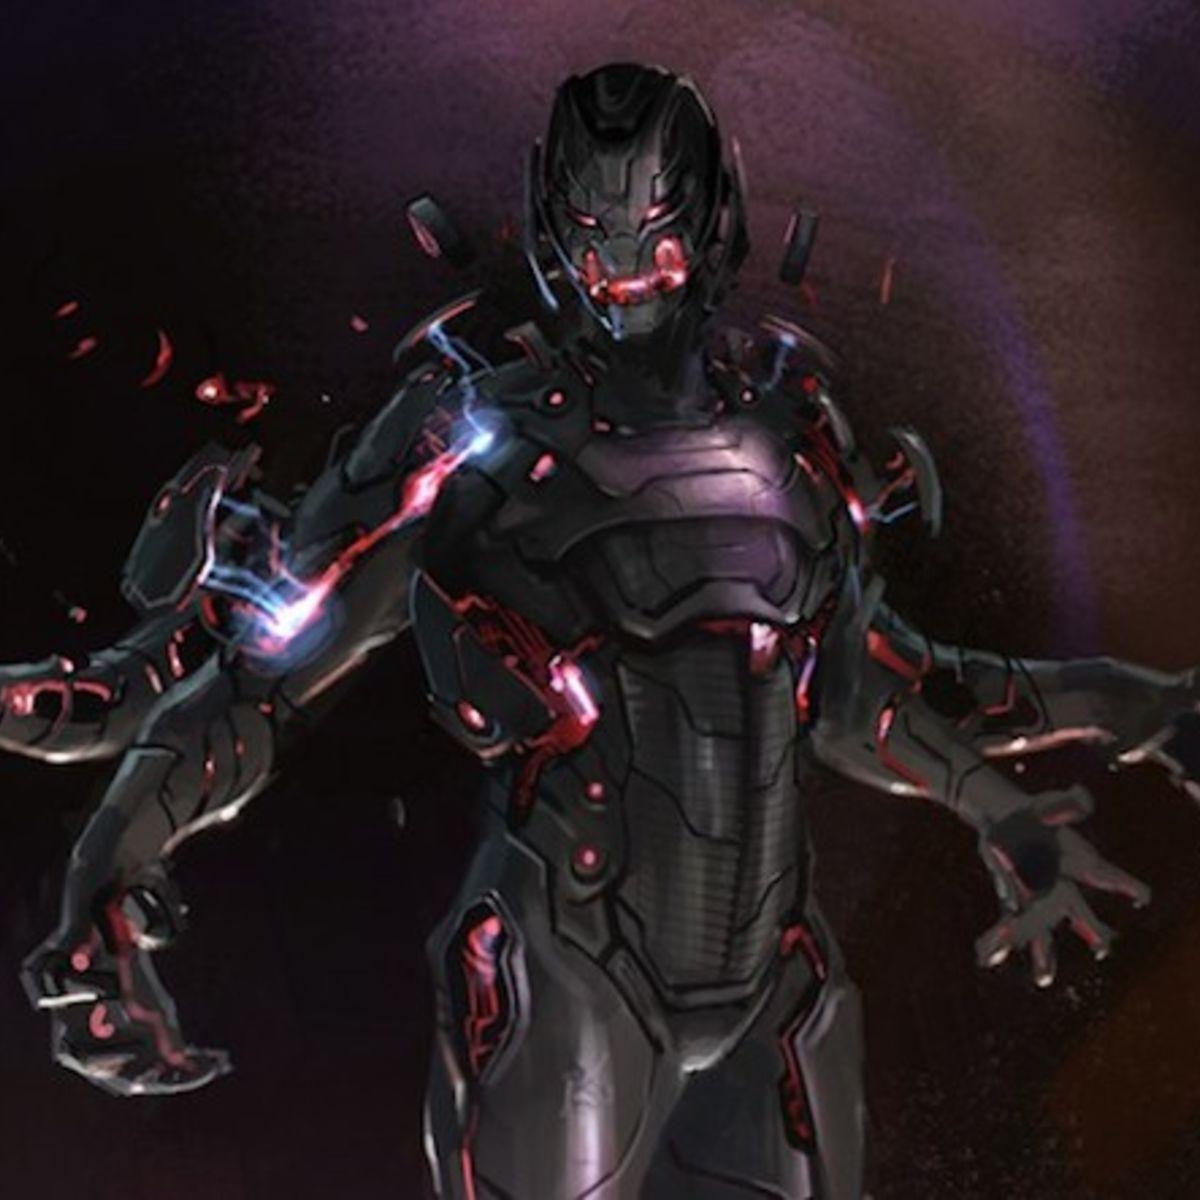 Avengers_Age_of_Ultron_Concept_Art_RF-08-680x1020-1.jpg